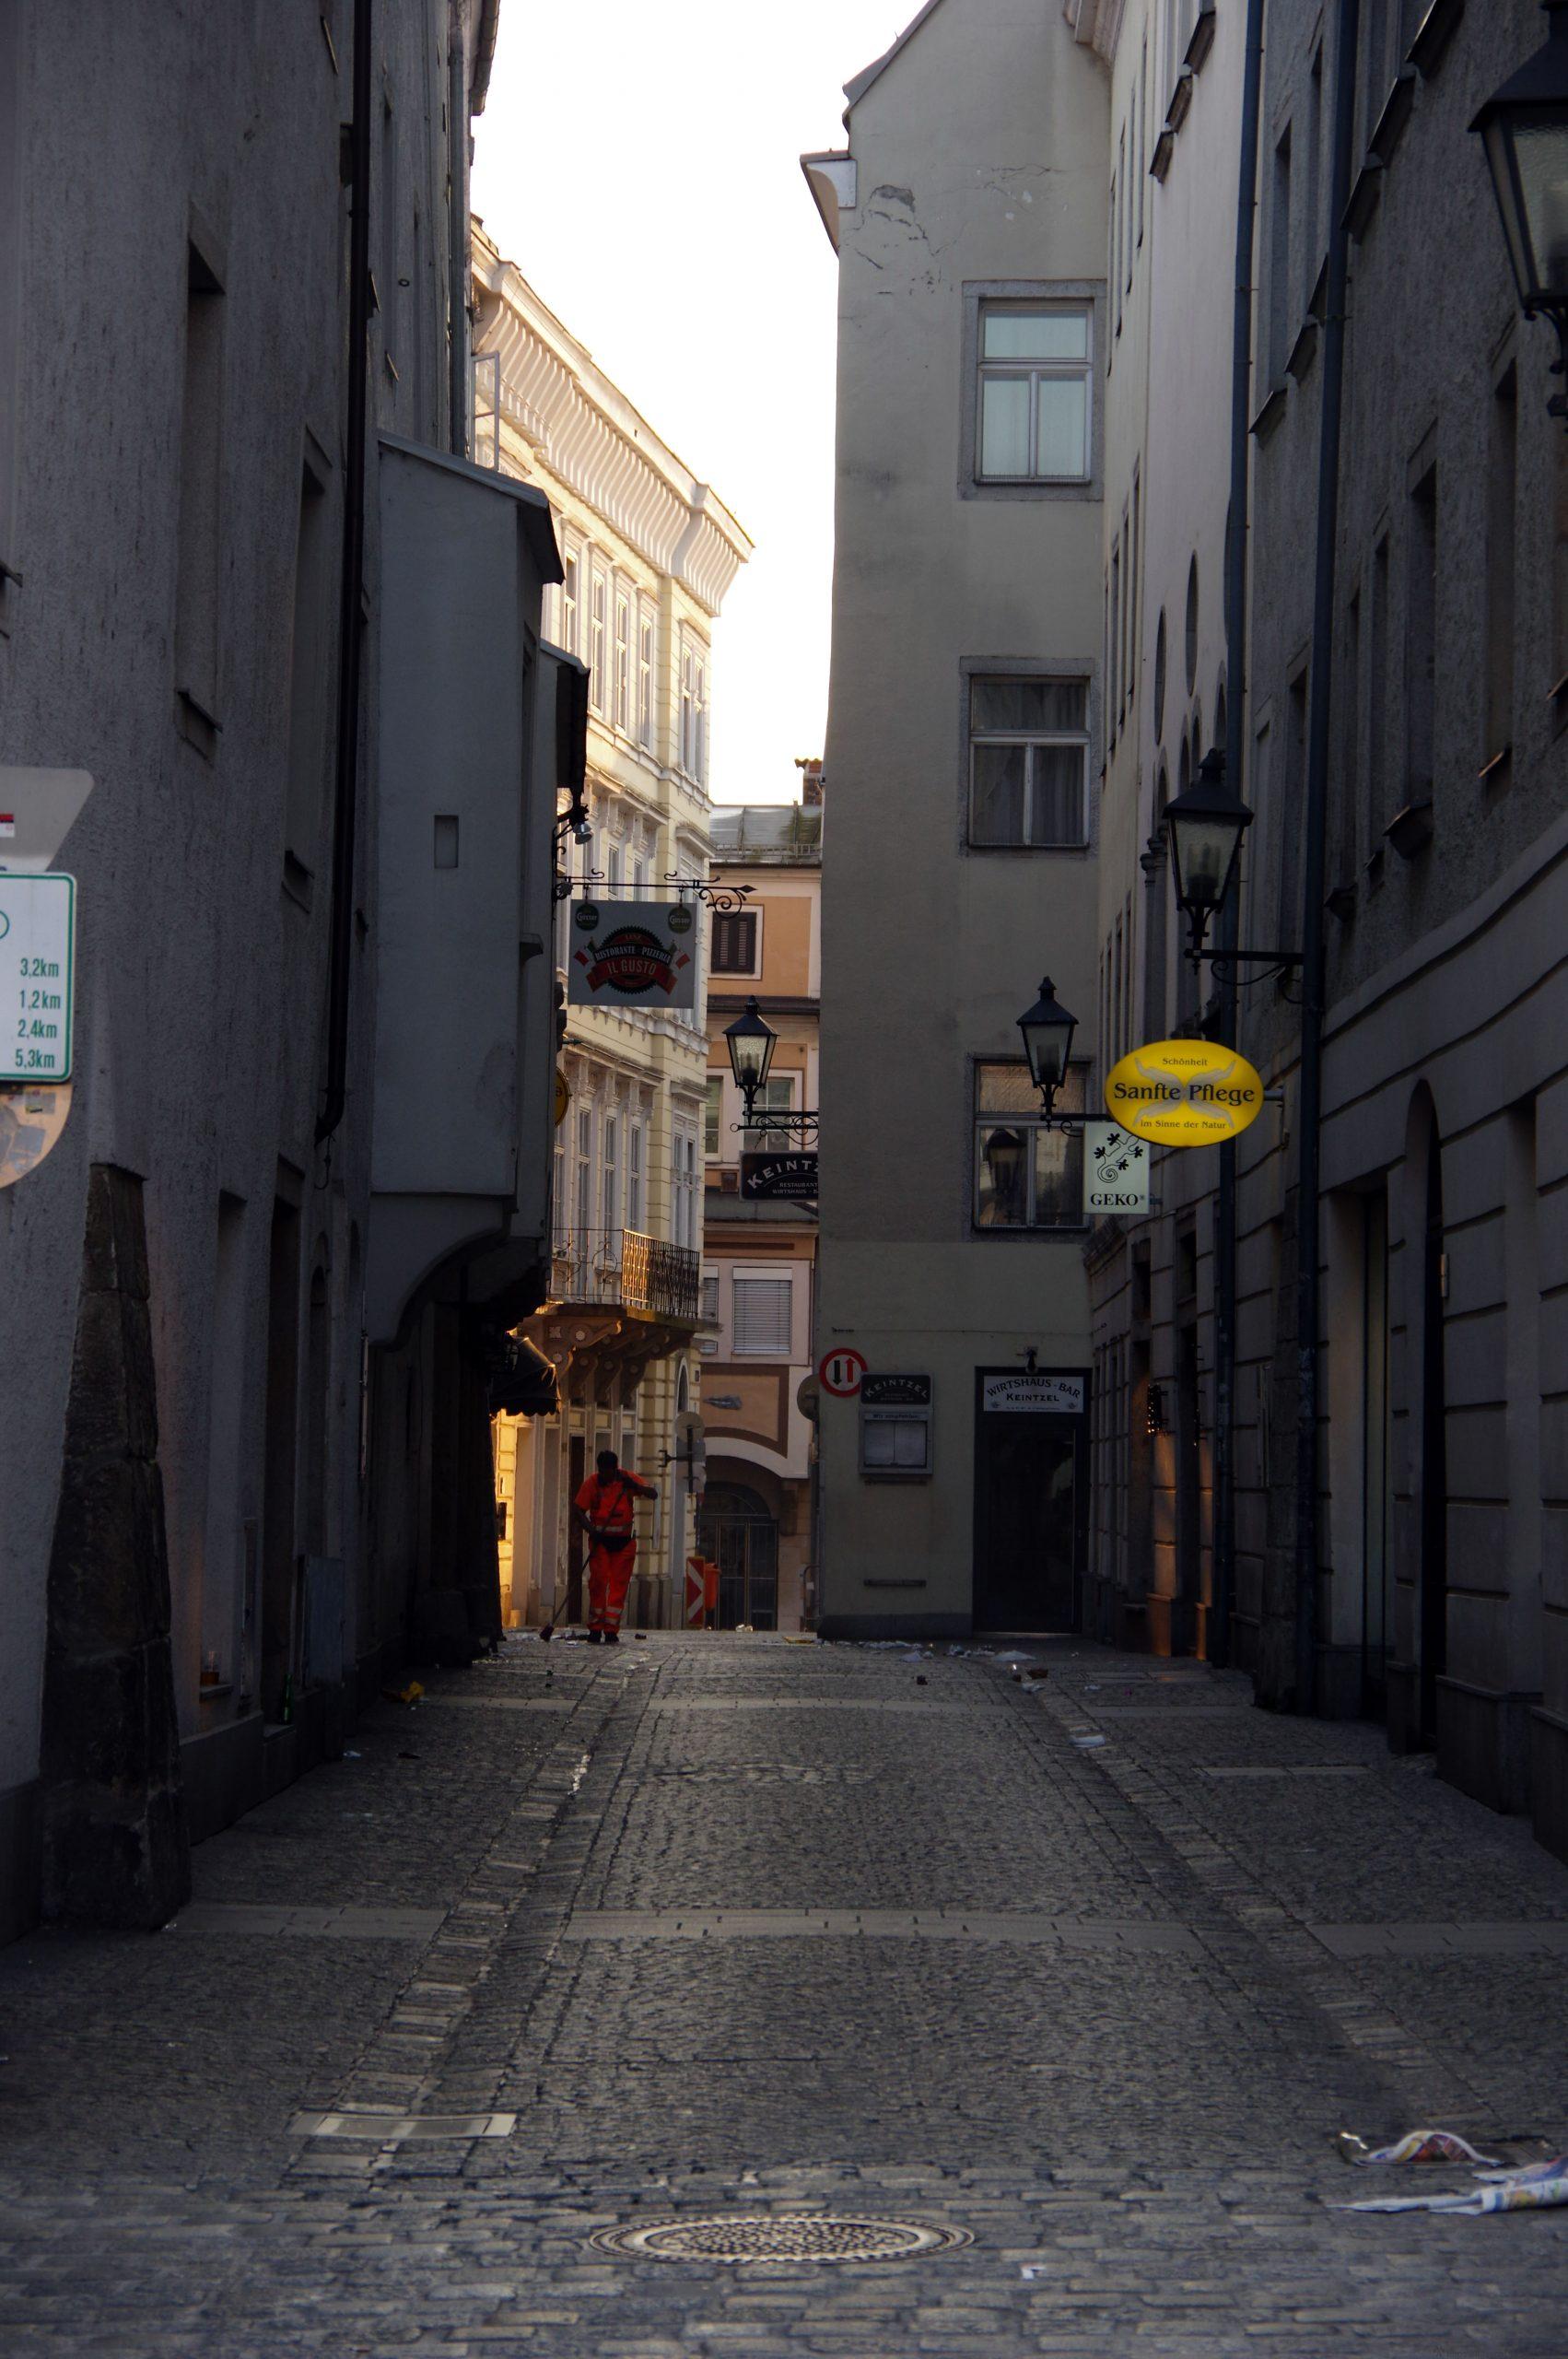 Linz, Austria, 2016